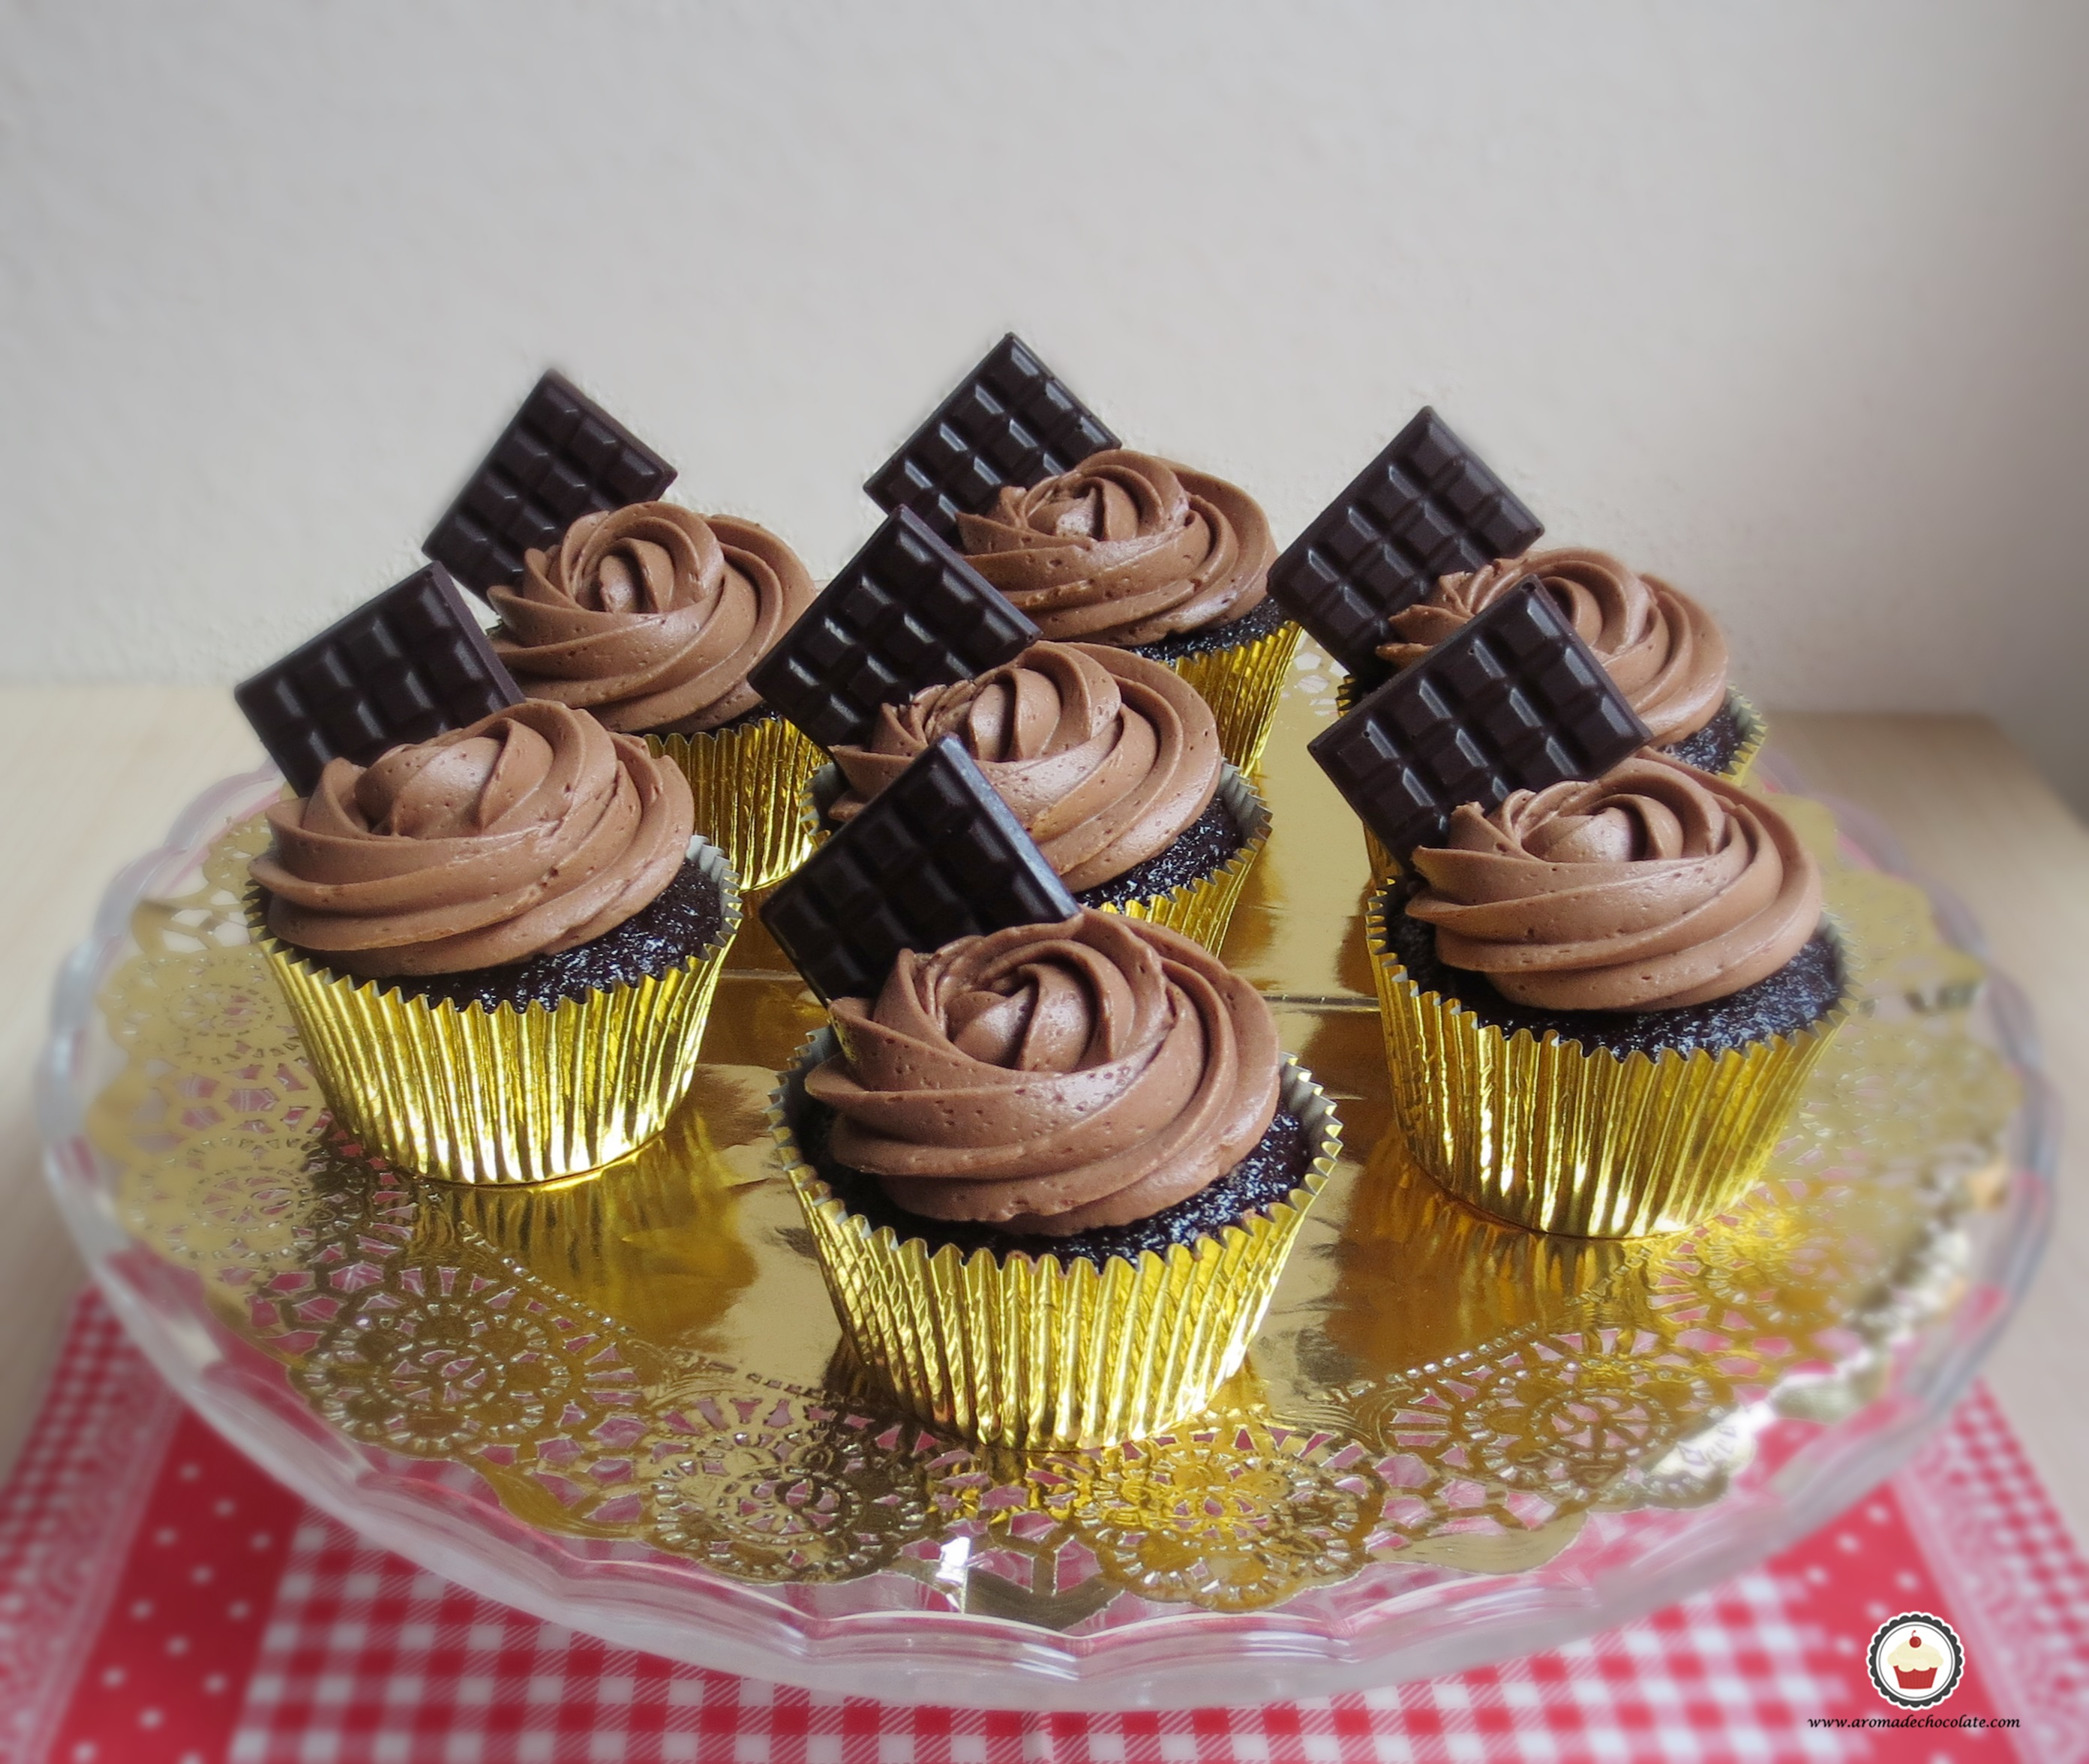 Cupcakes de chocolate. Aroma de chocolate